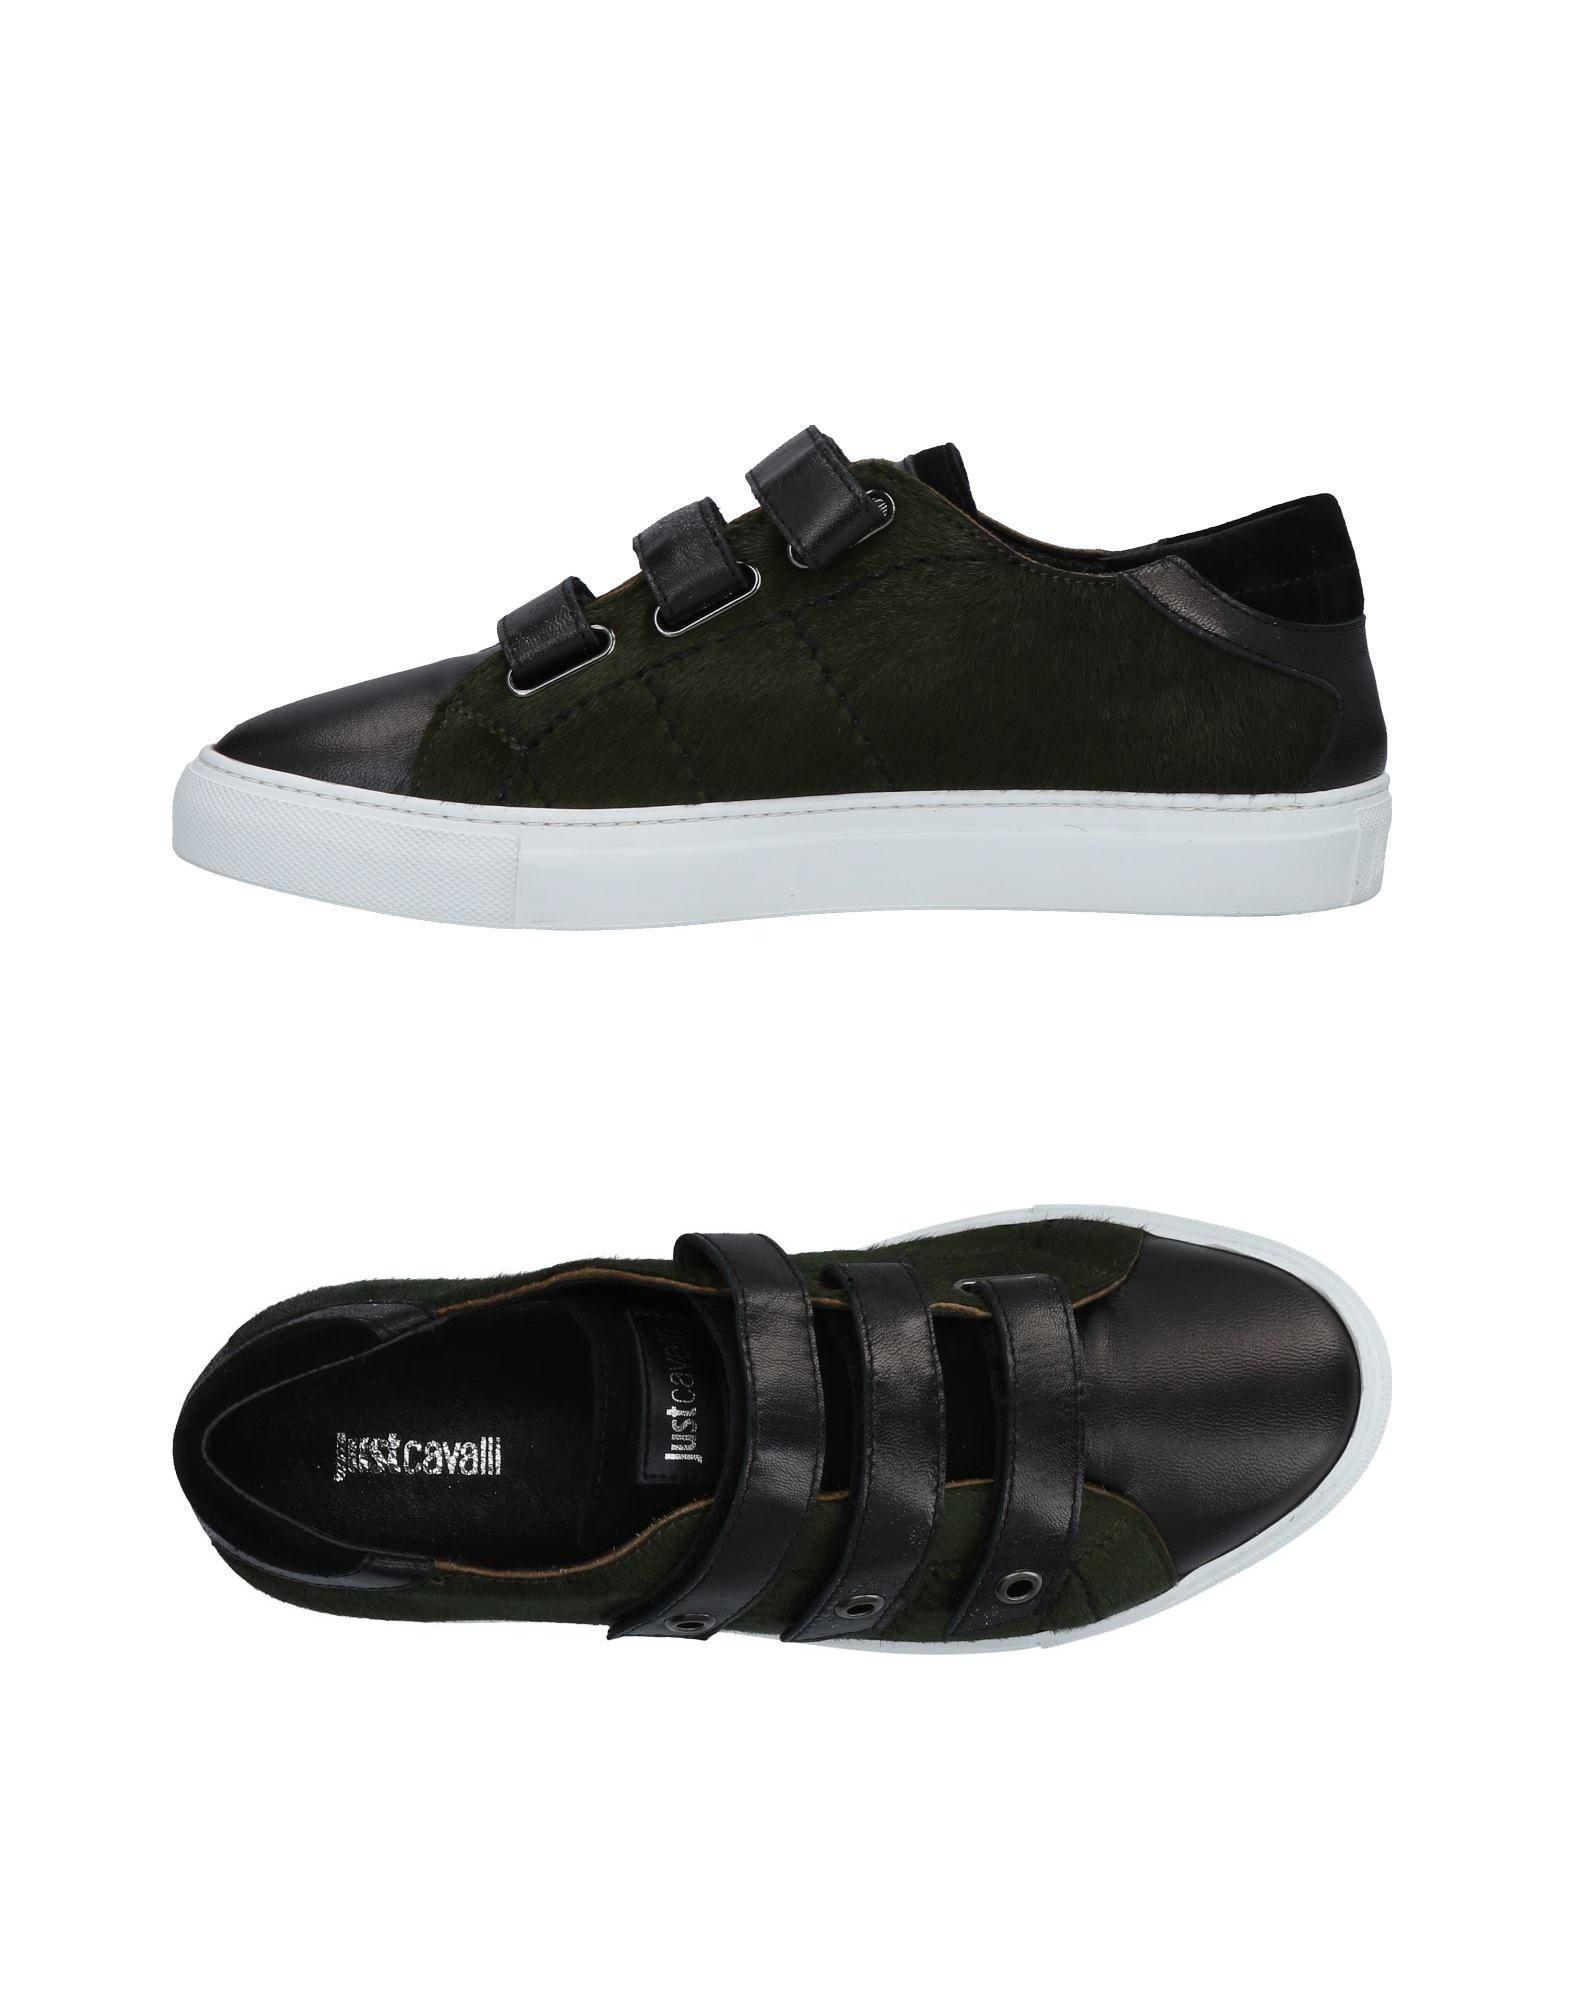 Just Cavalli Sneakers Herren  11472968VG Gute Qualität beliebte Schuhe